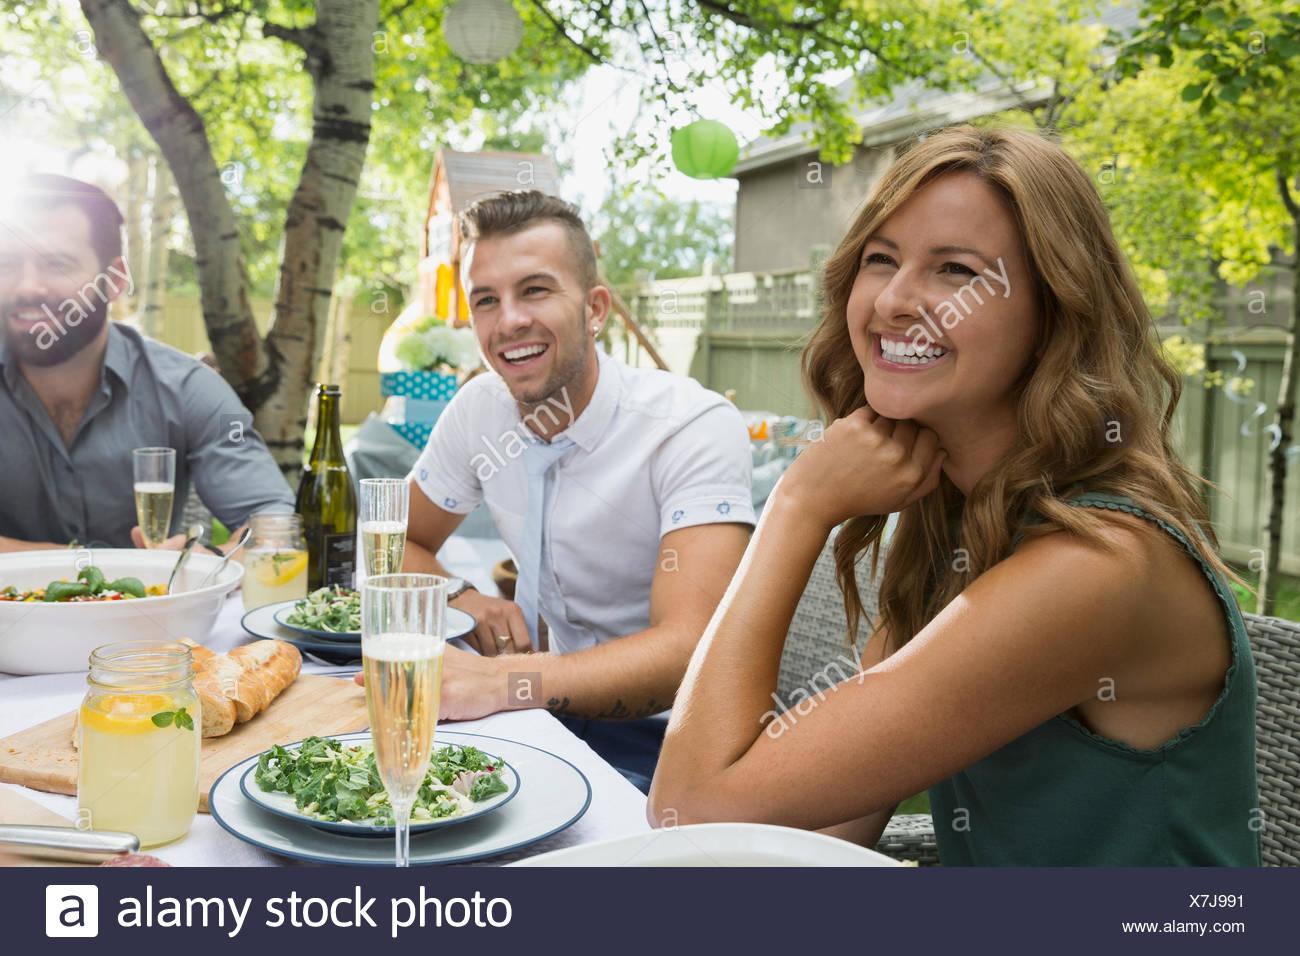 Smiling friends enjoying lunch garden party Photo Stock